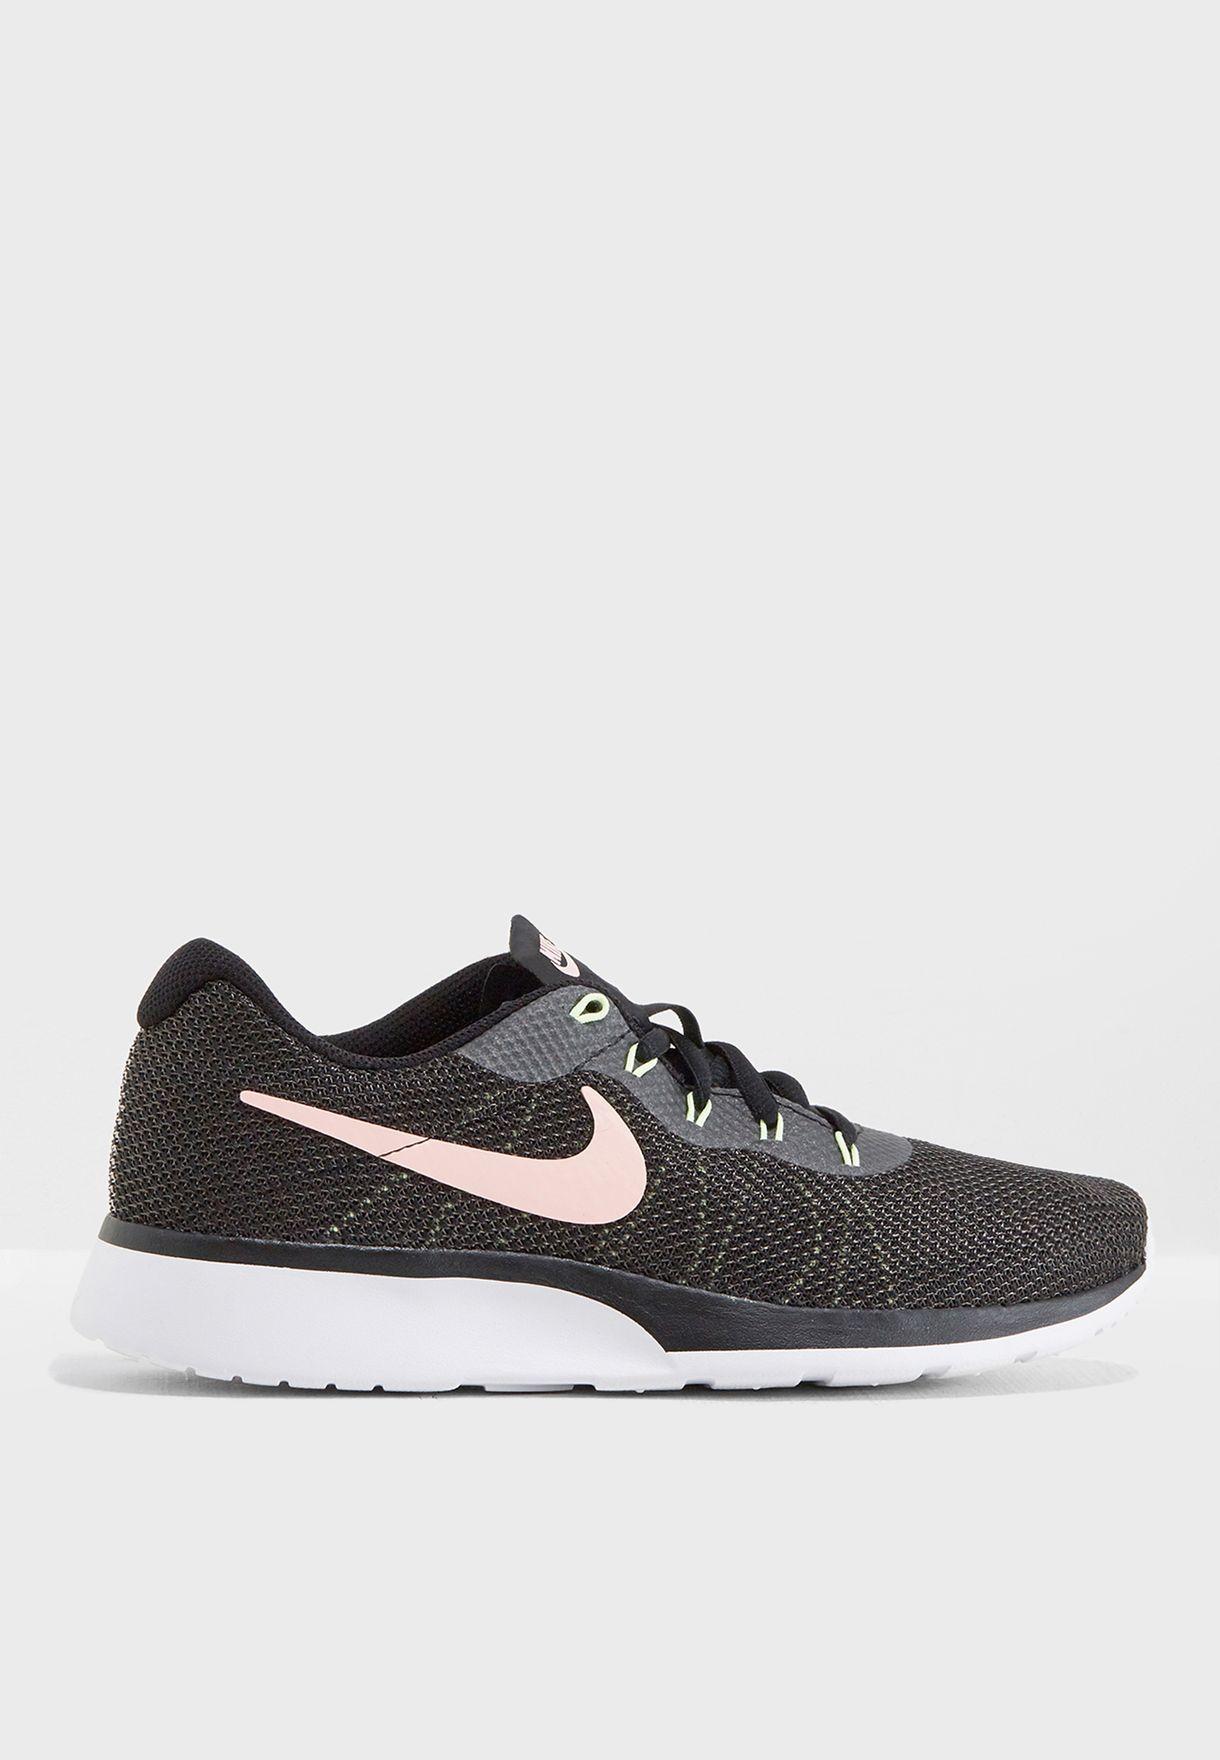 2bead09d5c4f Shop Nike multicolor Tanjun Racer 921668-009 for Women in UAE ...